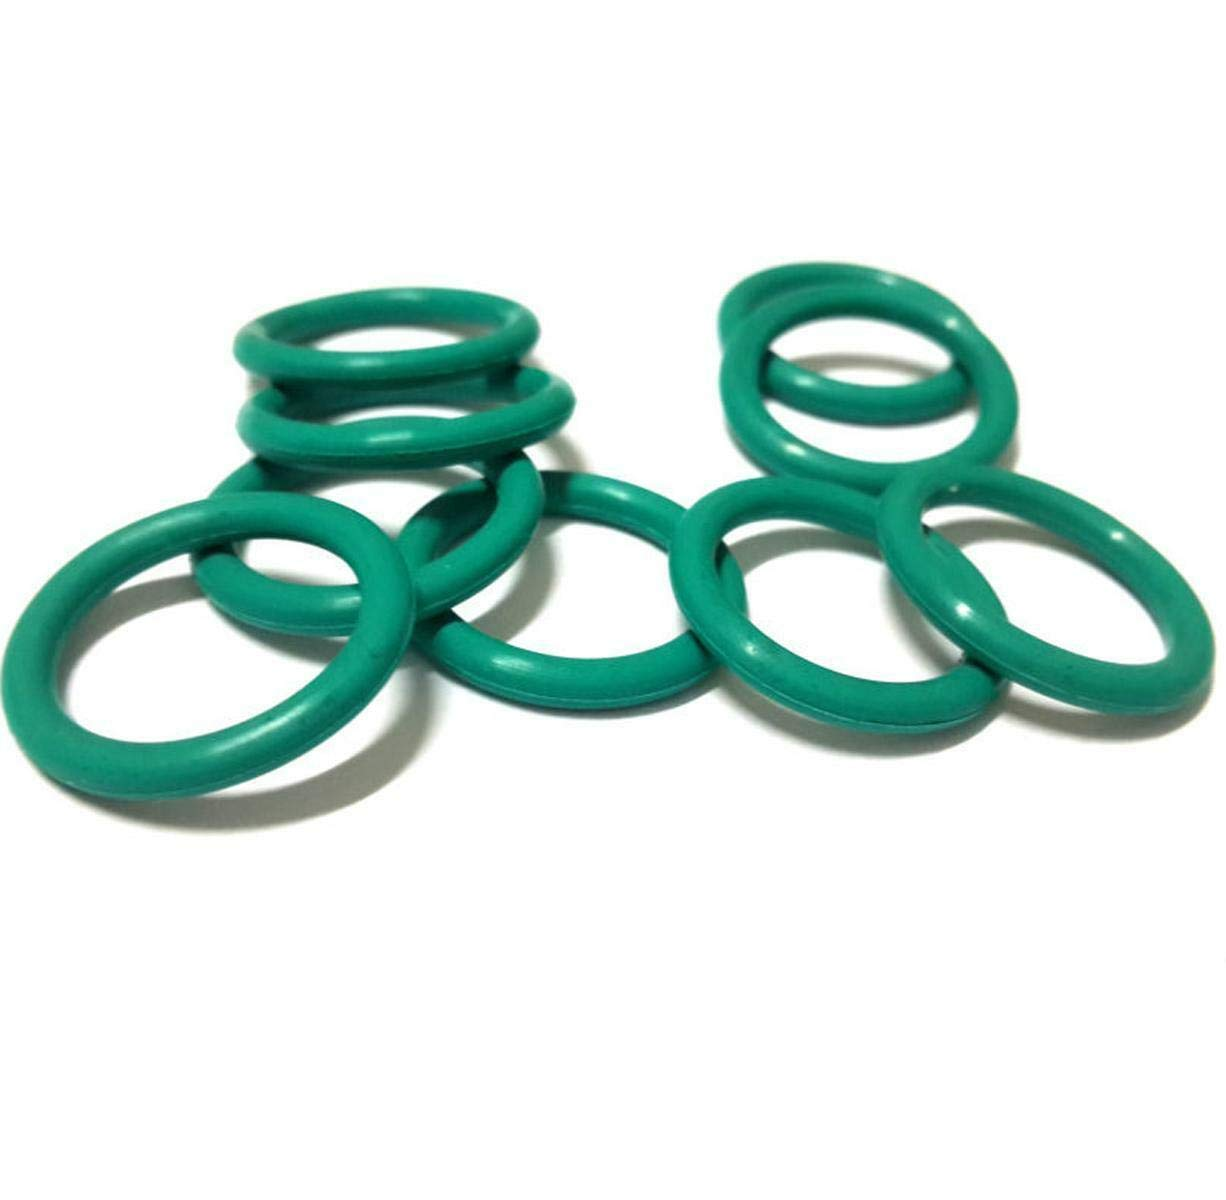 50pcs 22mm OD 19mm ID 1.5mm Dia Seal Fluorine Rubber O-Ring